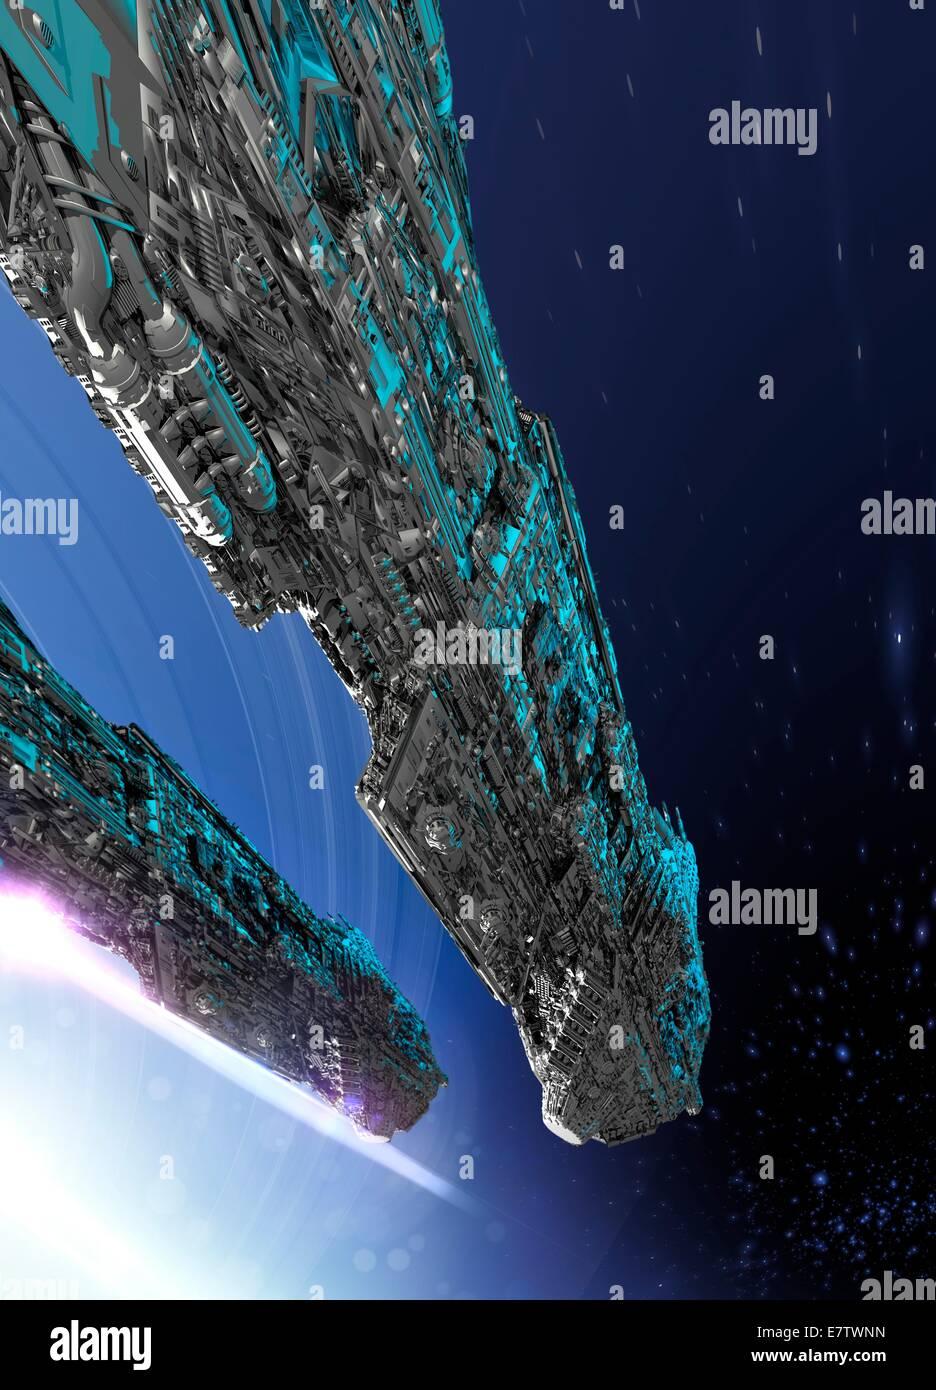 Spaceship, computer artwork. - Stock Image